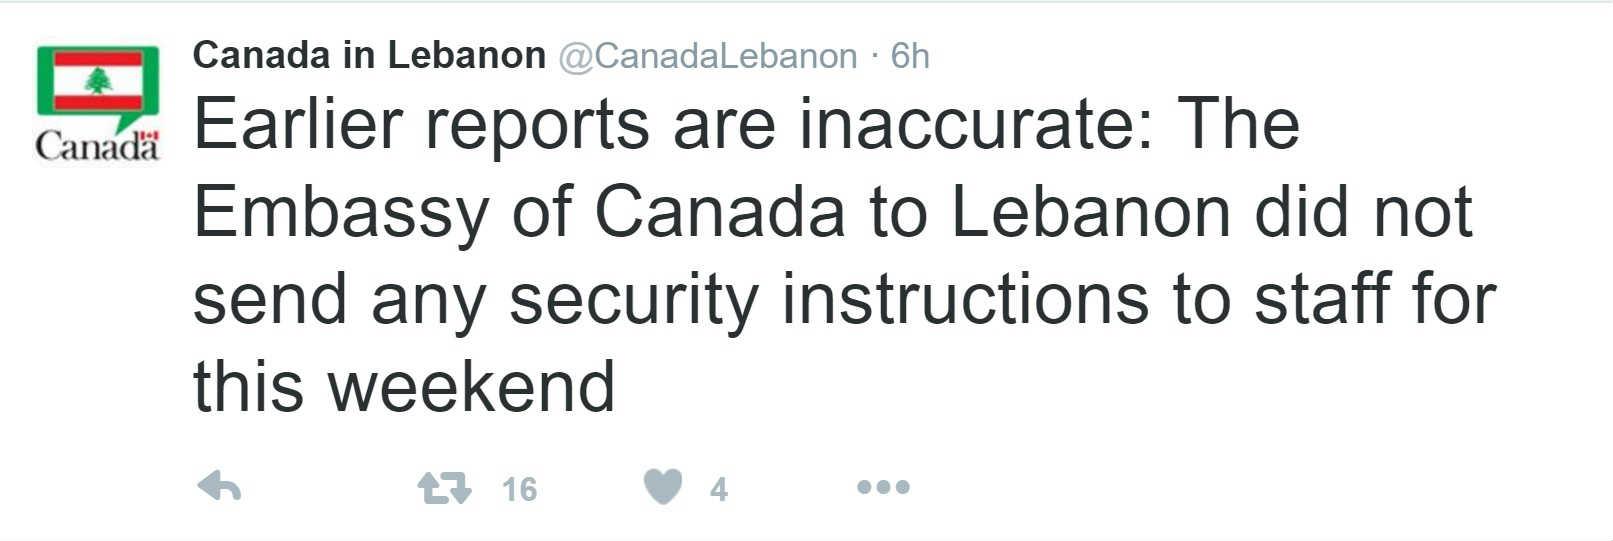 Canada warning